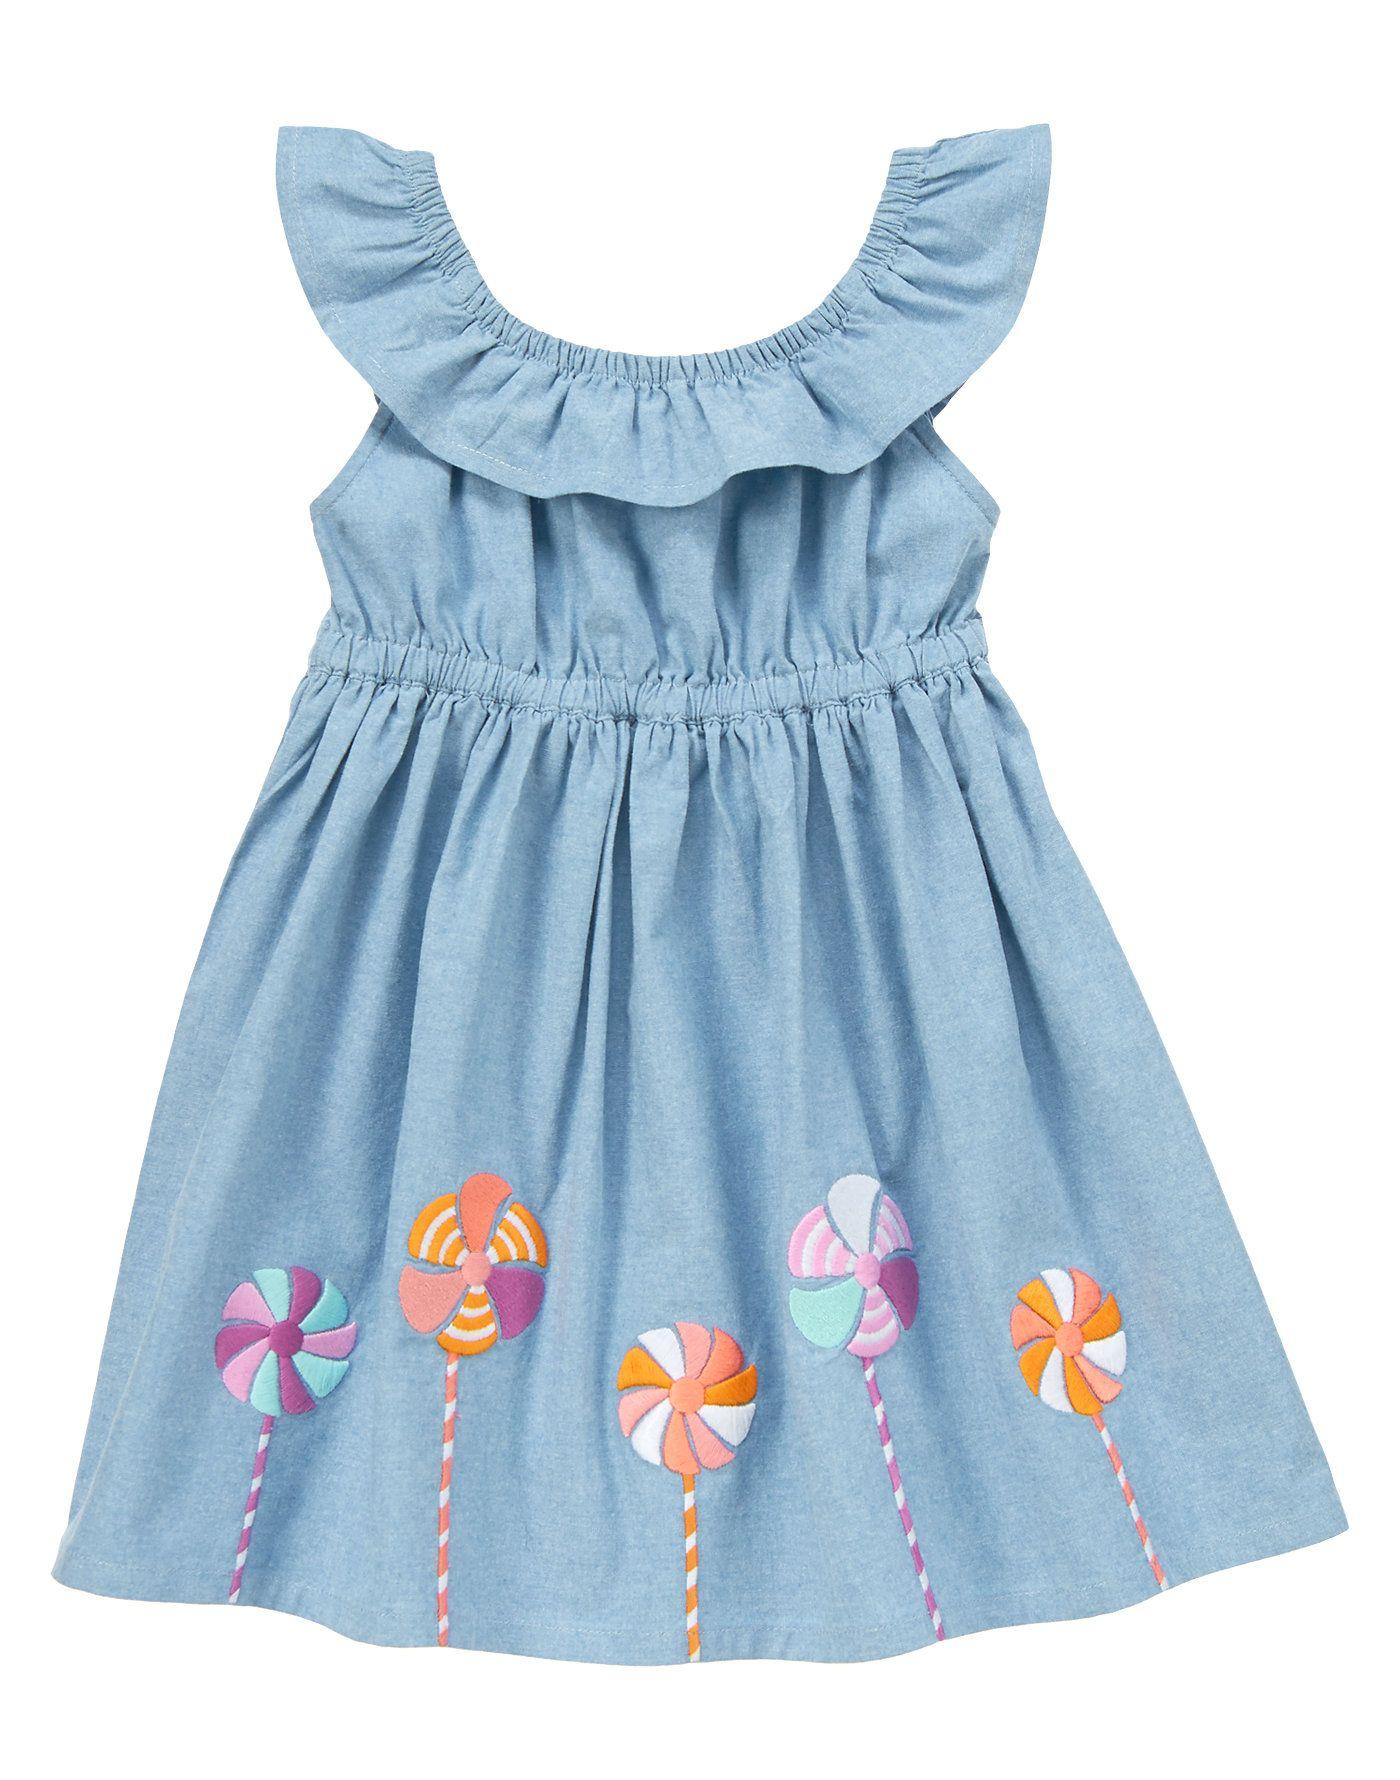 11c36927b0825 Chambray Pinwheel Dress at Gymboree | (Future) Baby Girl Fever ...